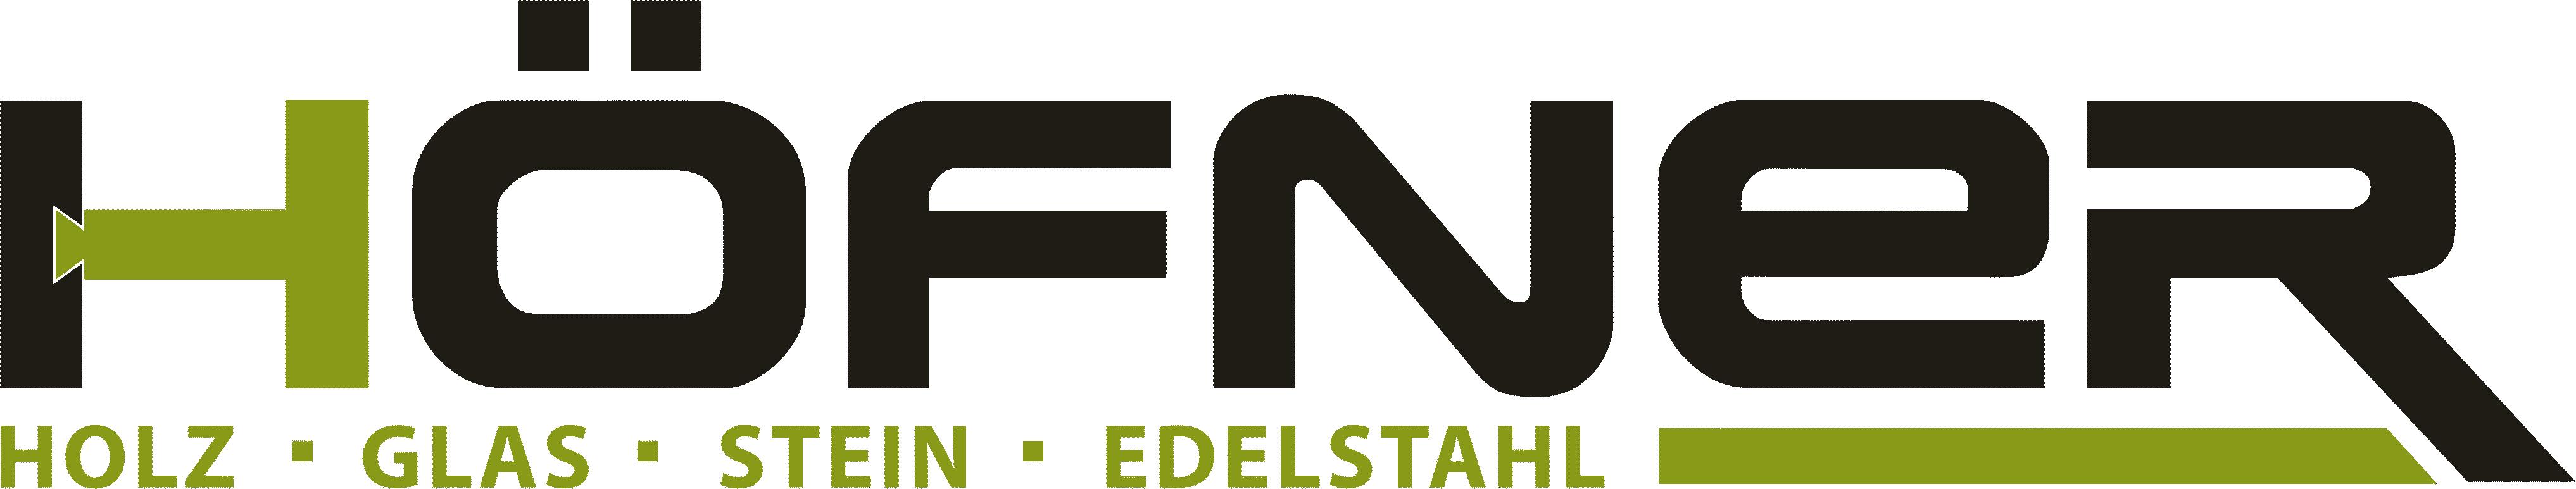 Höfner GmbH Logo